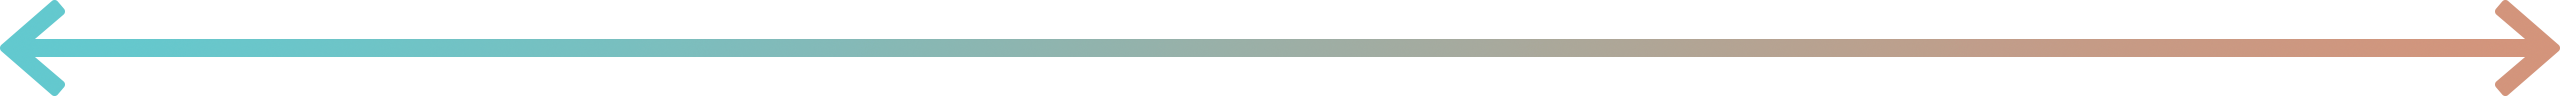 meng-he-brewgorithm-spectrum